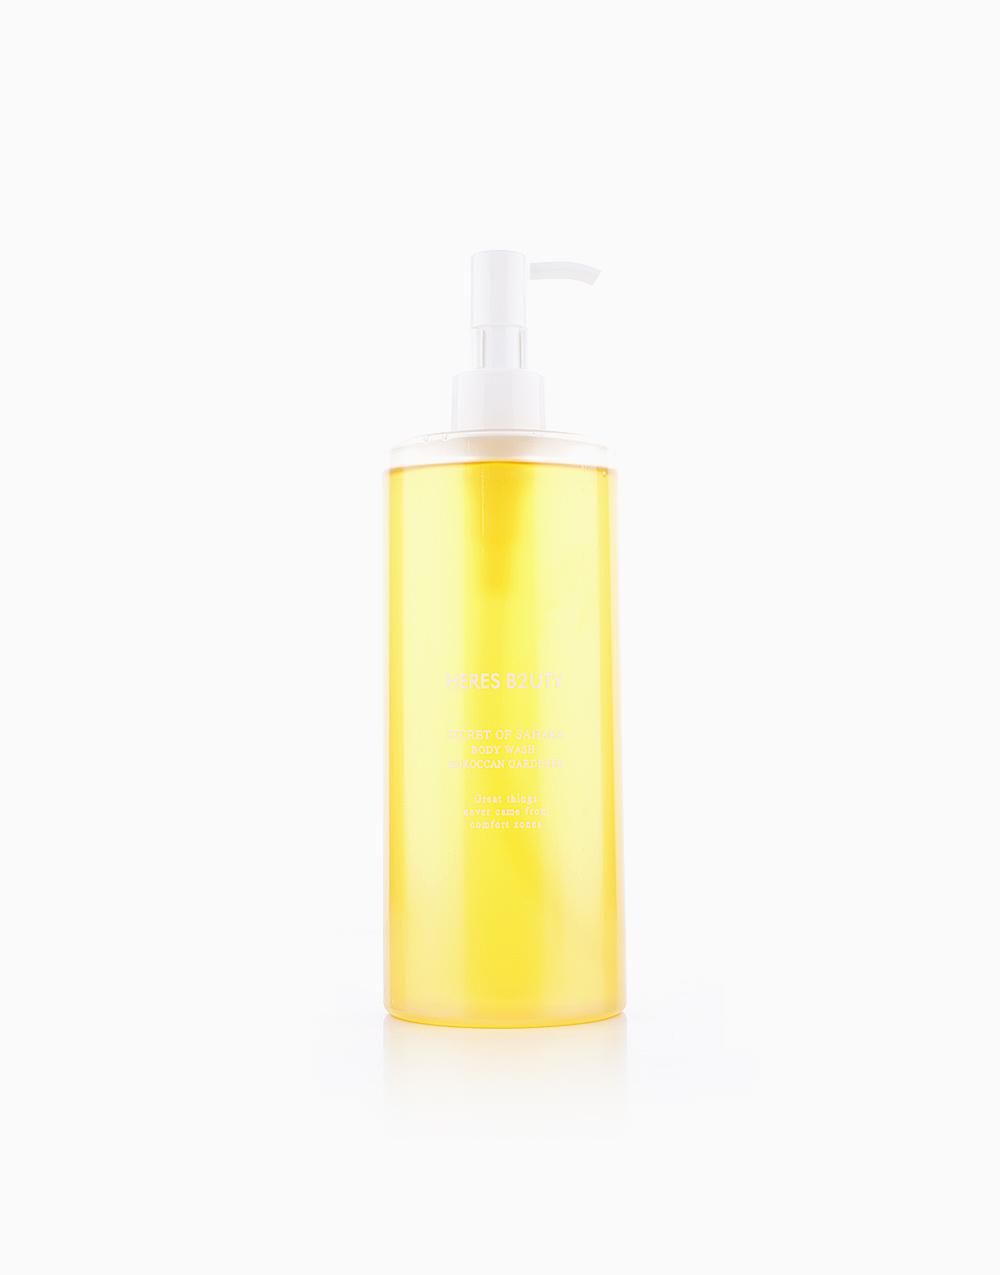 Fragrant Body Wash in Seychelles by Here's B2uty